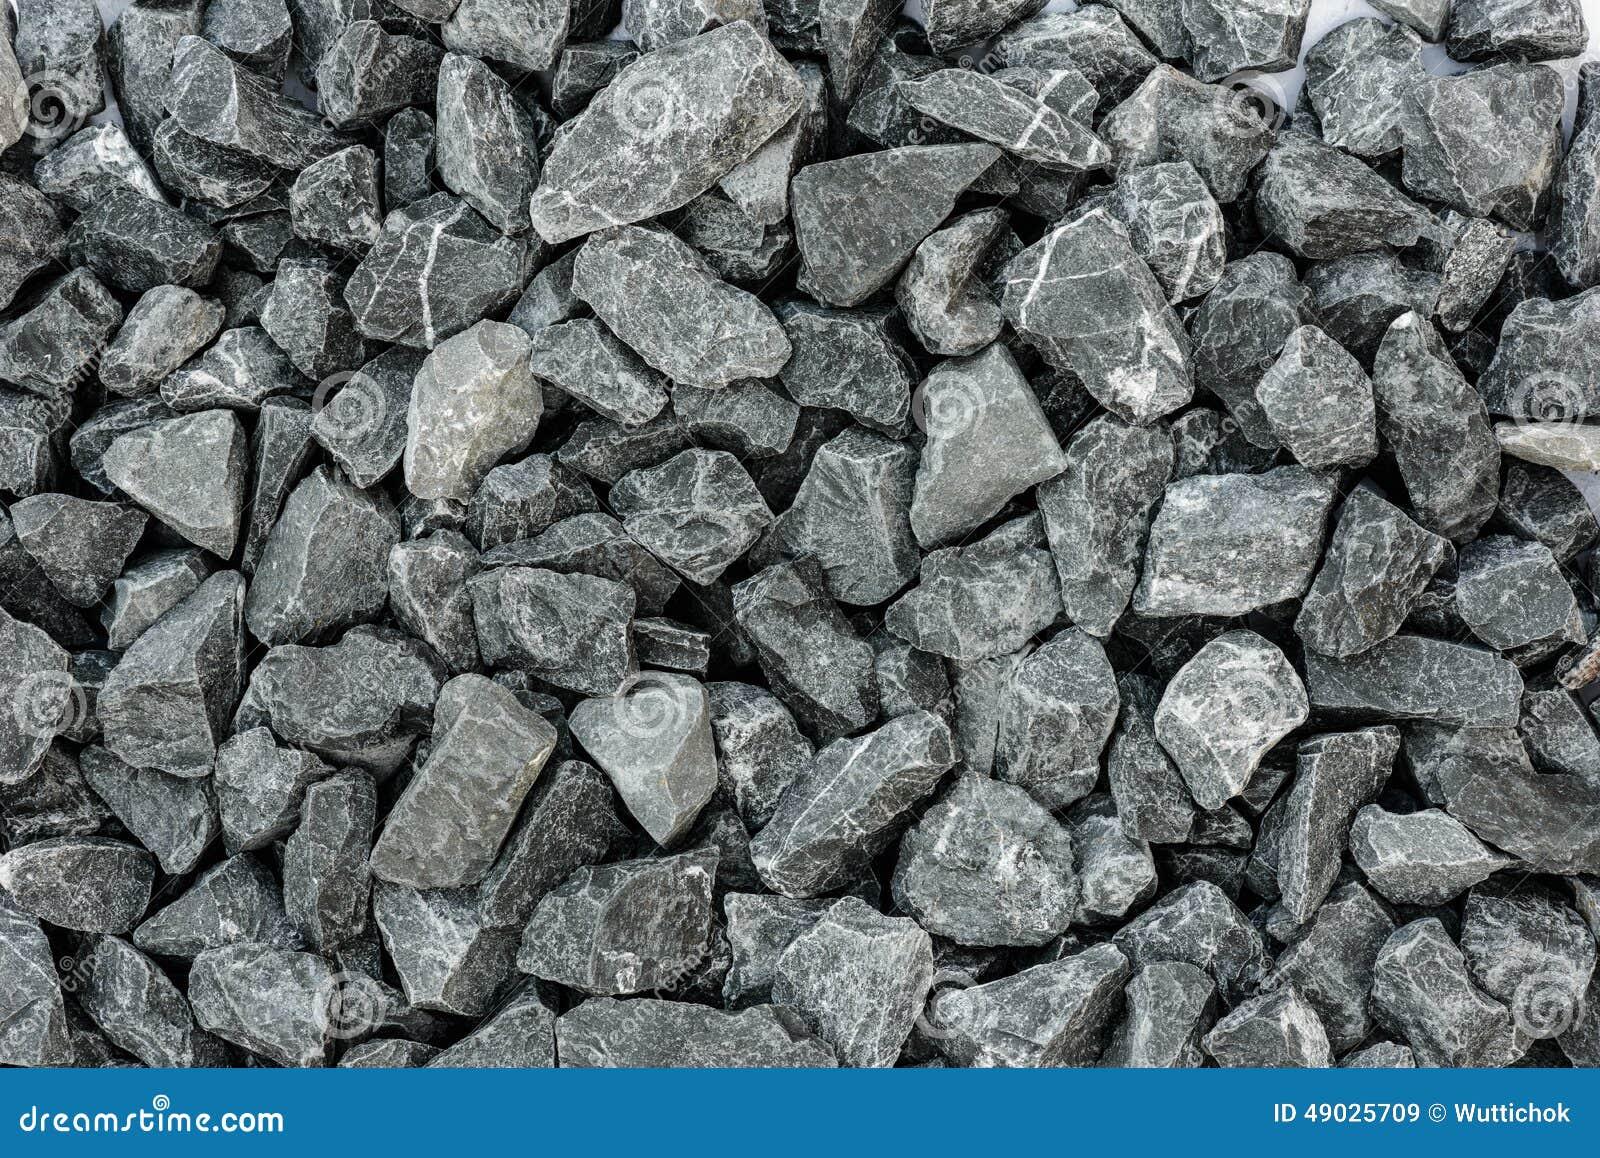 Grey Granite Gravel Background For Mix Concrete Stock